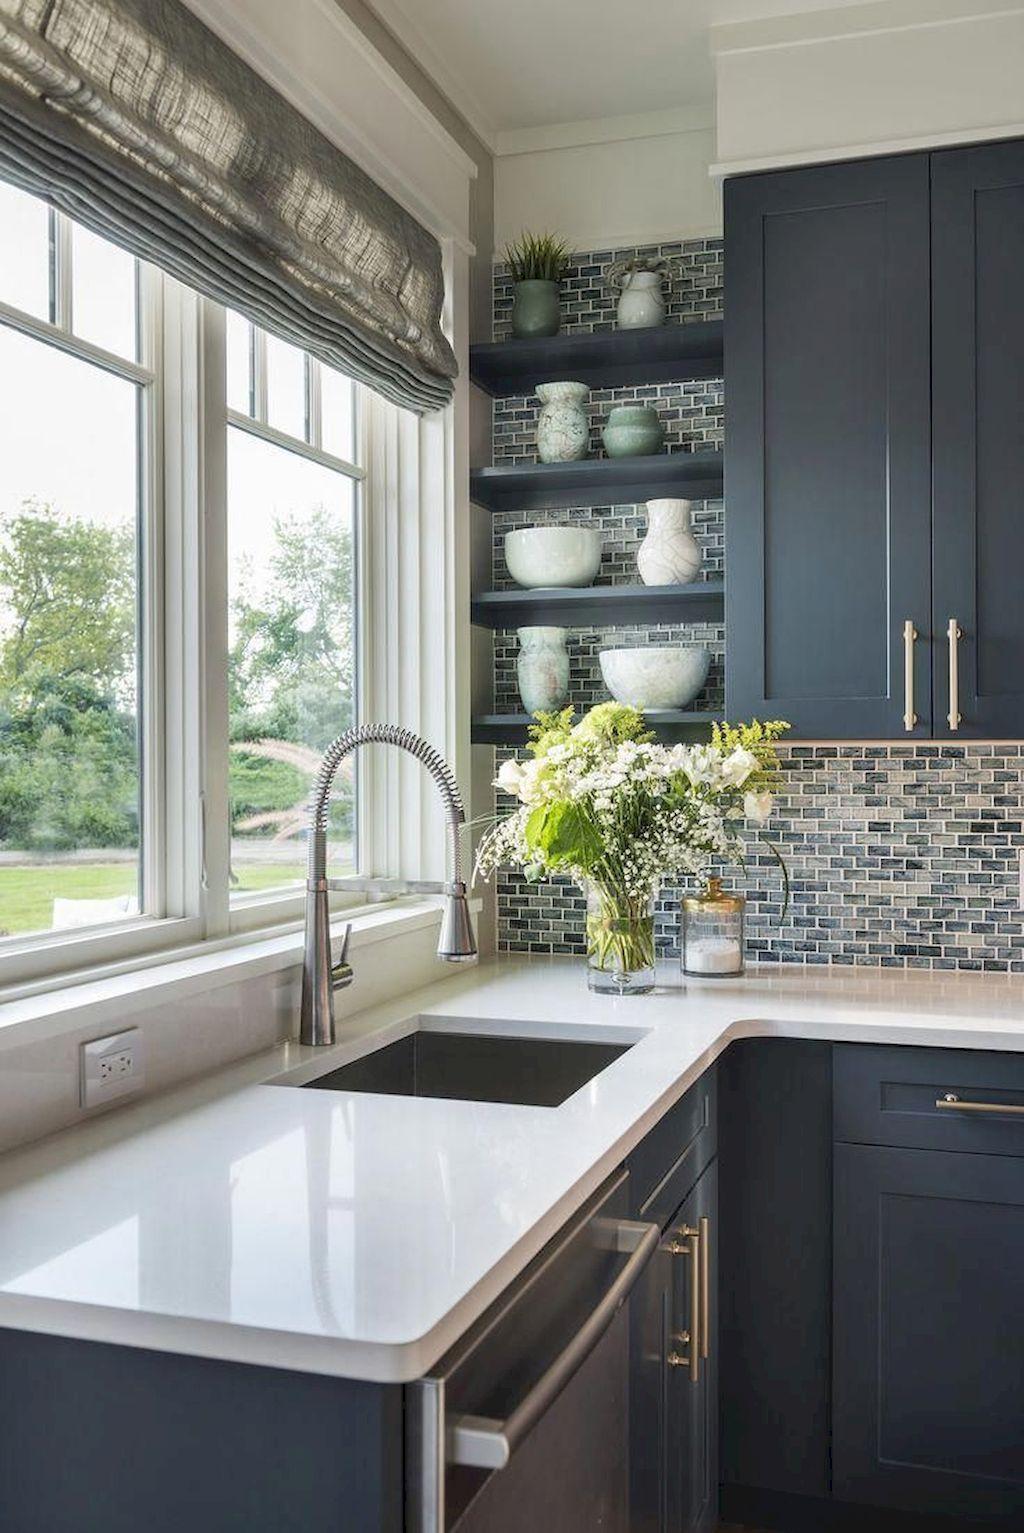 Stunning Backsplash Ideas for Neutral Color Kitchen   Elonahome.com